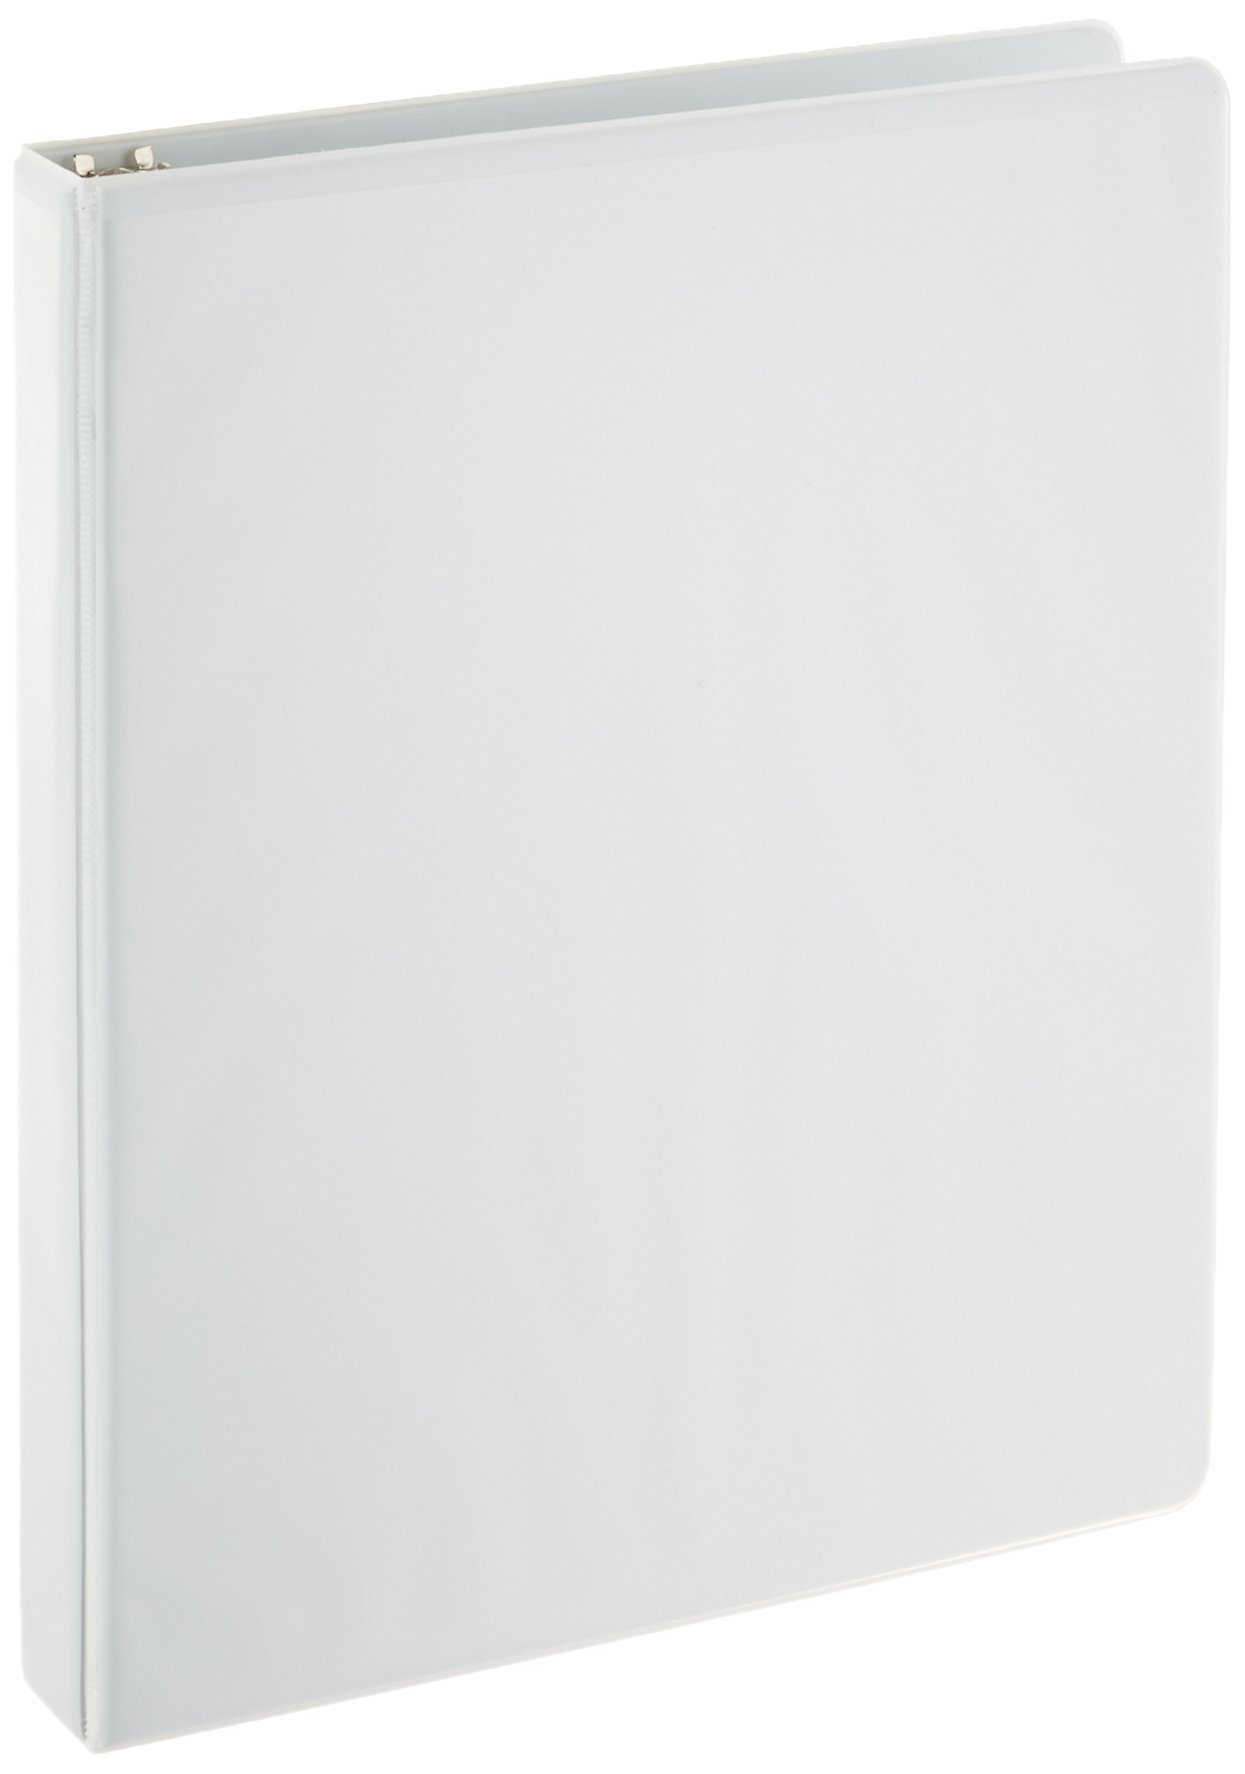 Amazonbasics  Ring Binder  Inch  Pack White